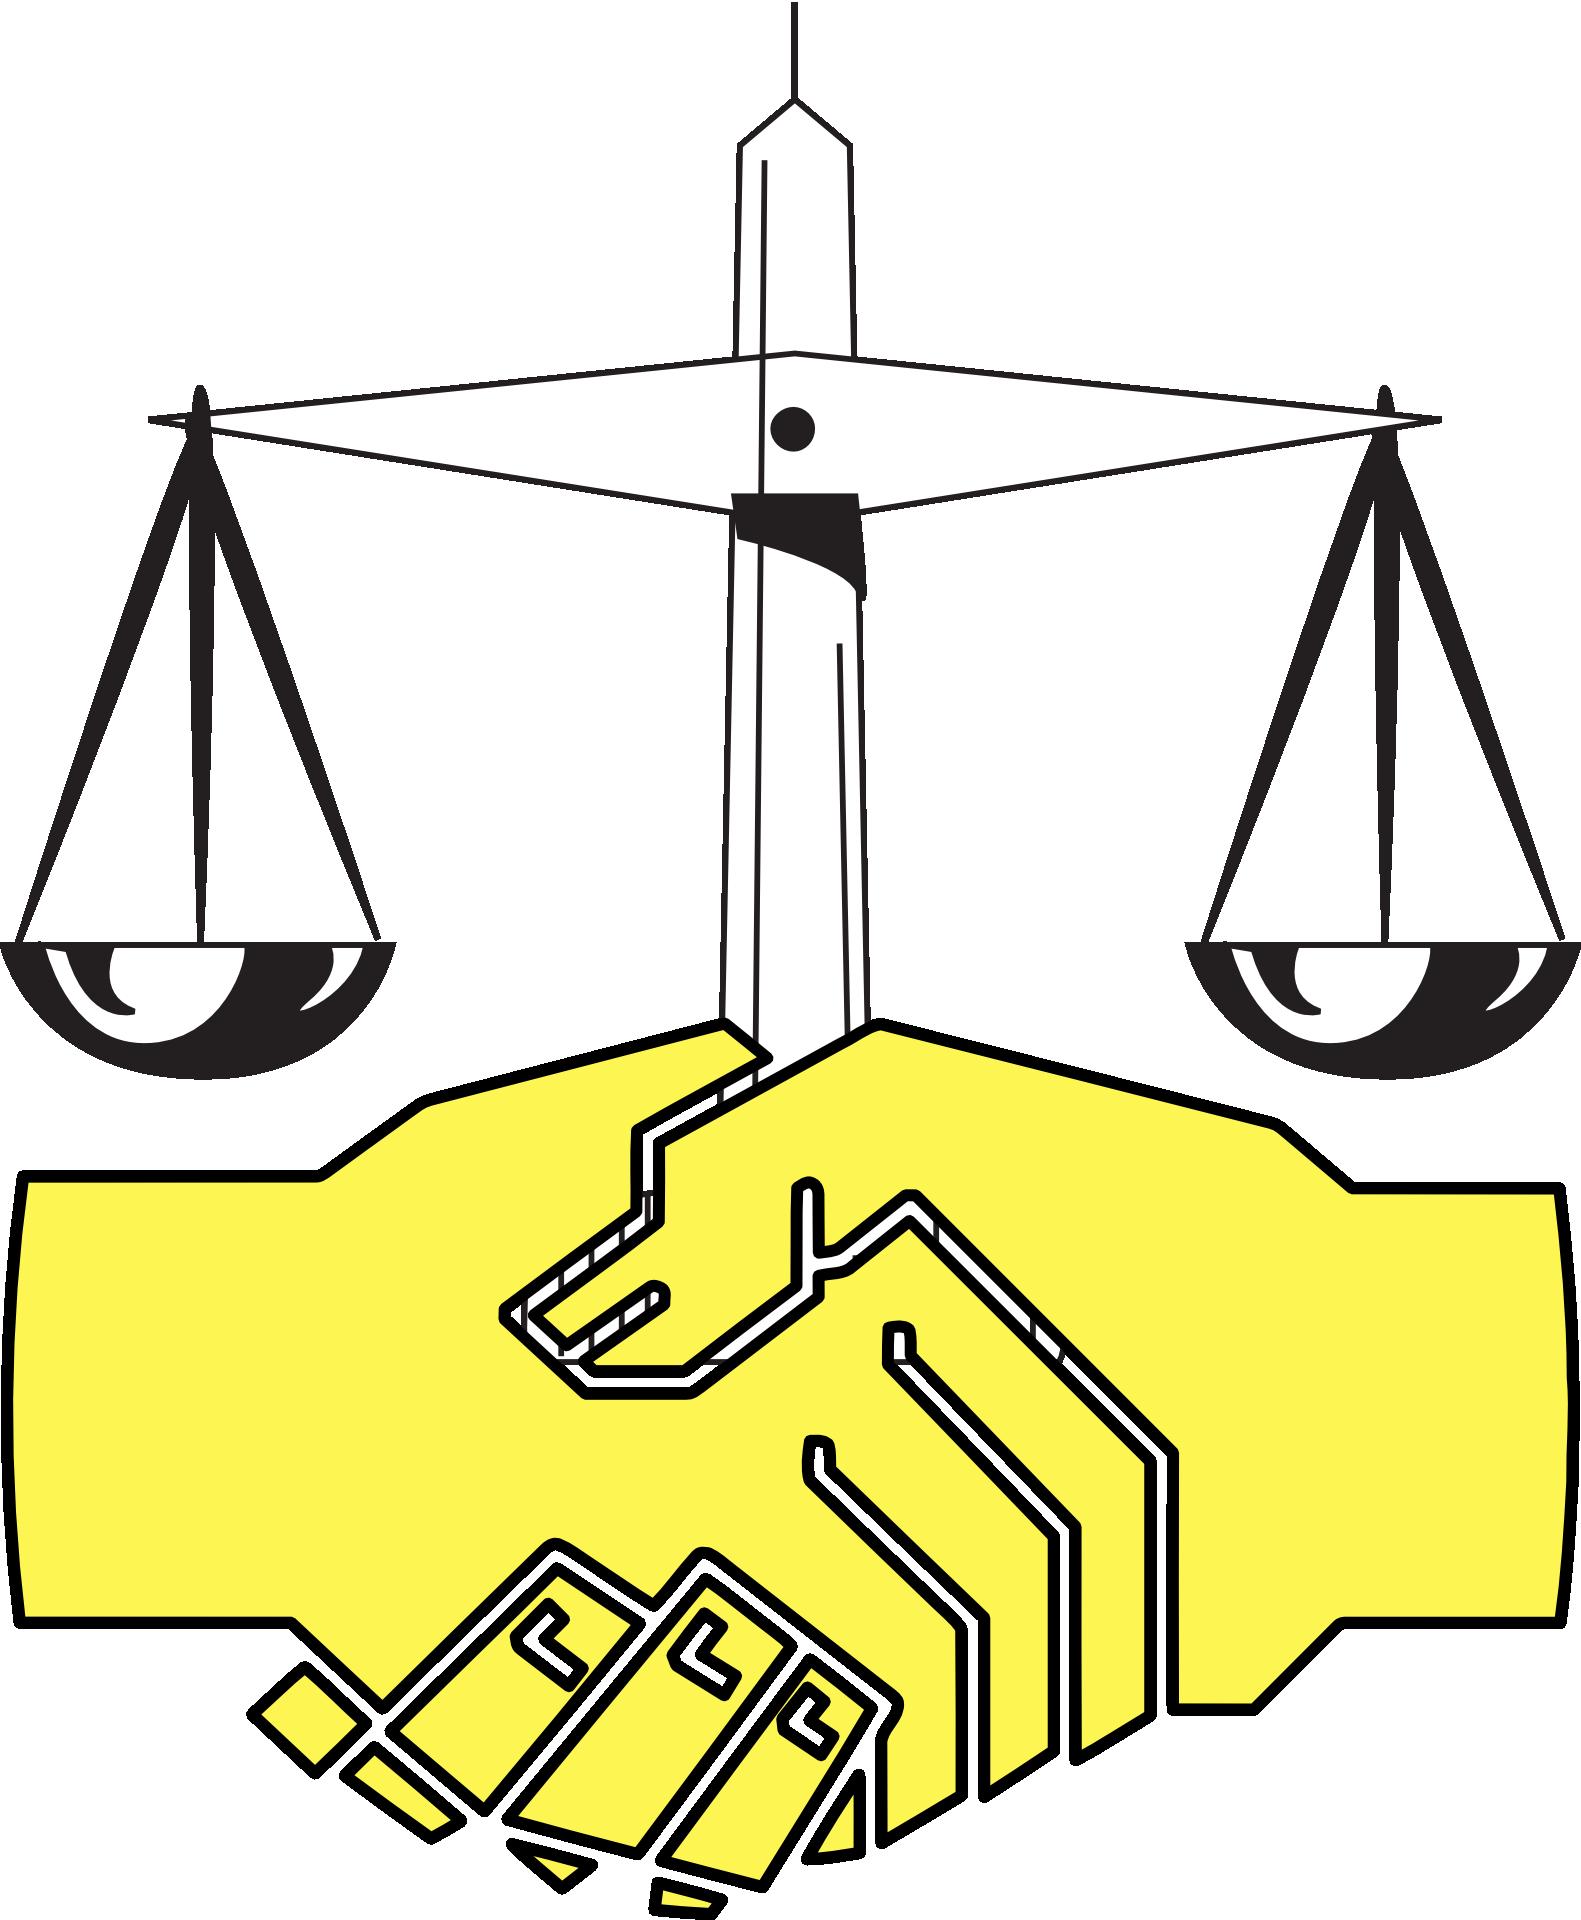 ontslag arbeidsrecht